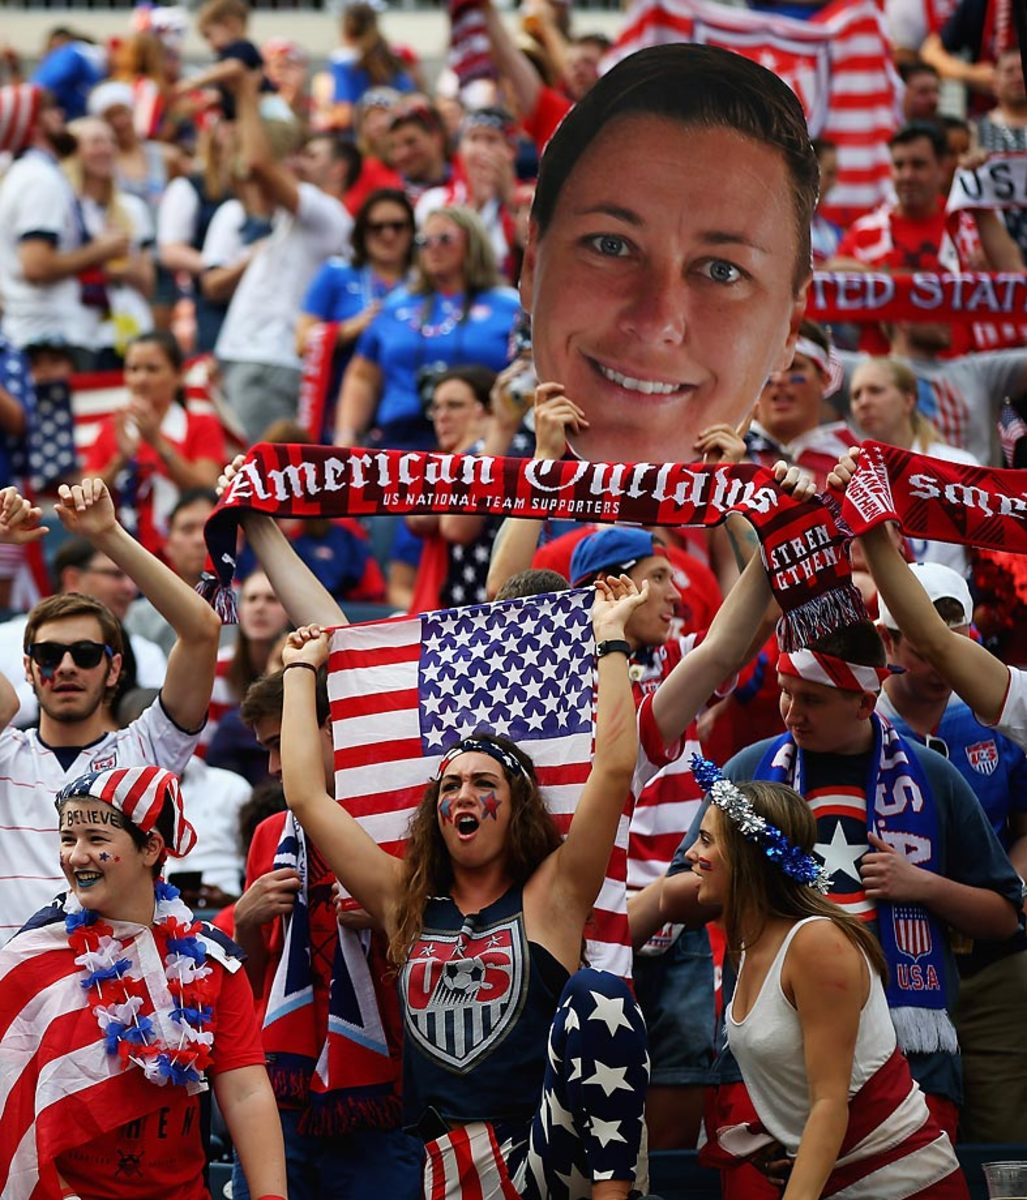 world-cup-fans-476385948_master.jpg